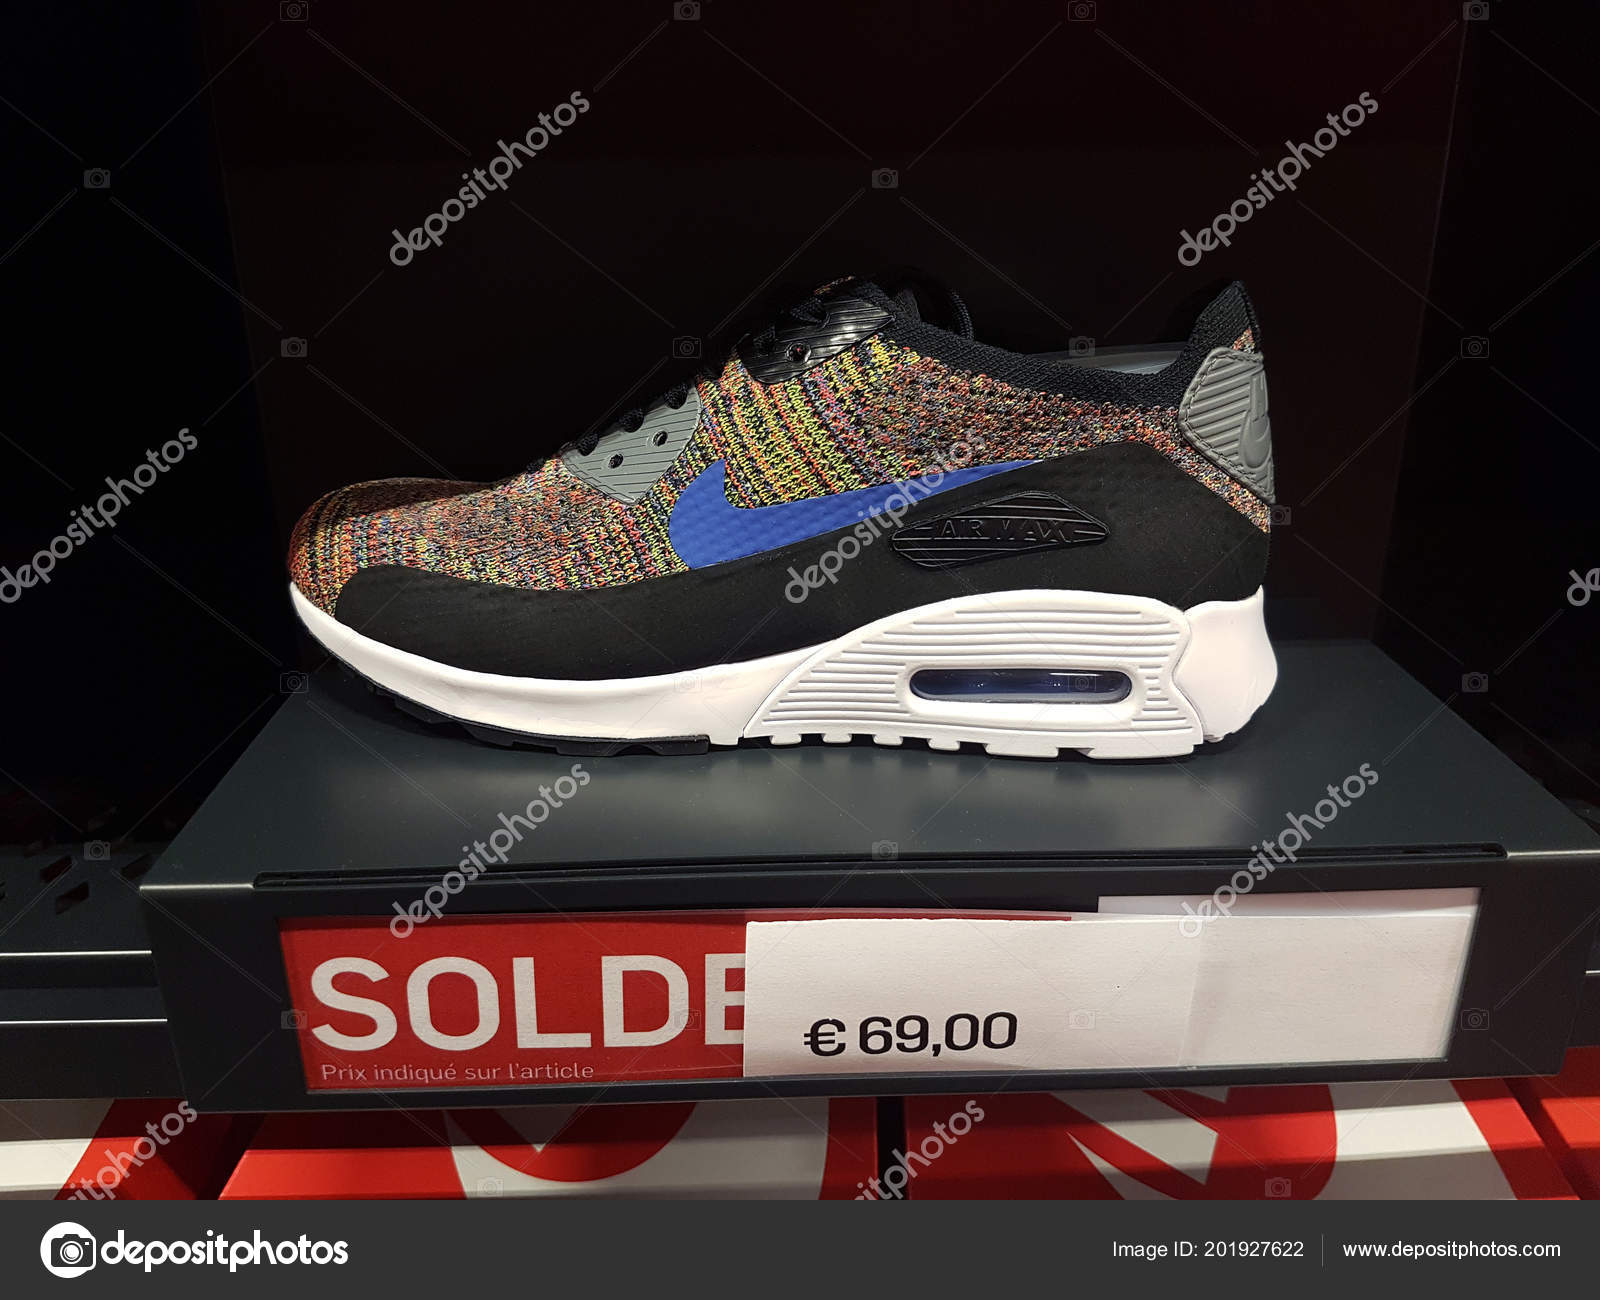 pas mal e4e3c e471a Villefontaine France July 2018 Multicolor Nike Air Max Shoe ...